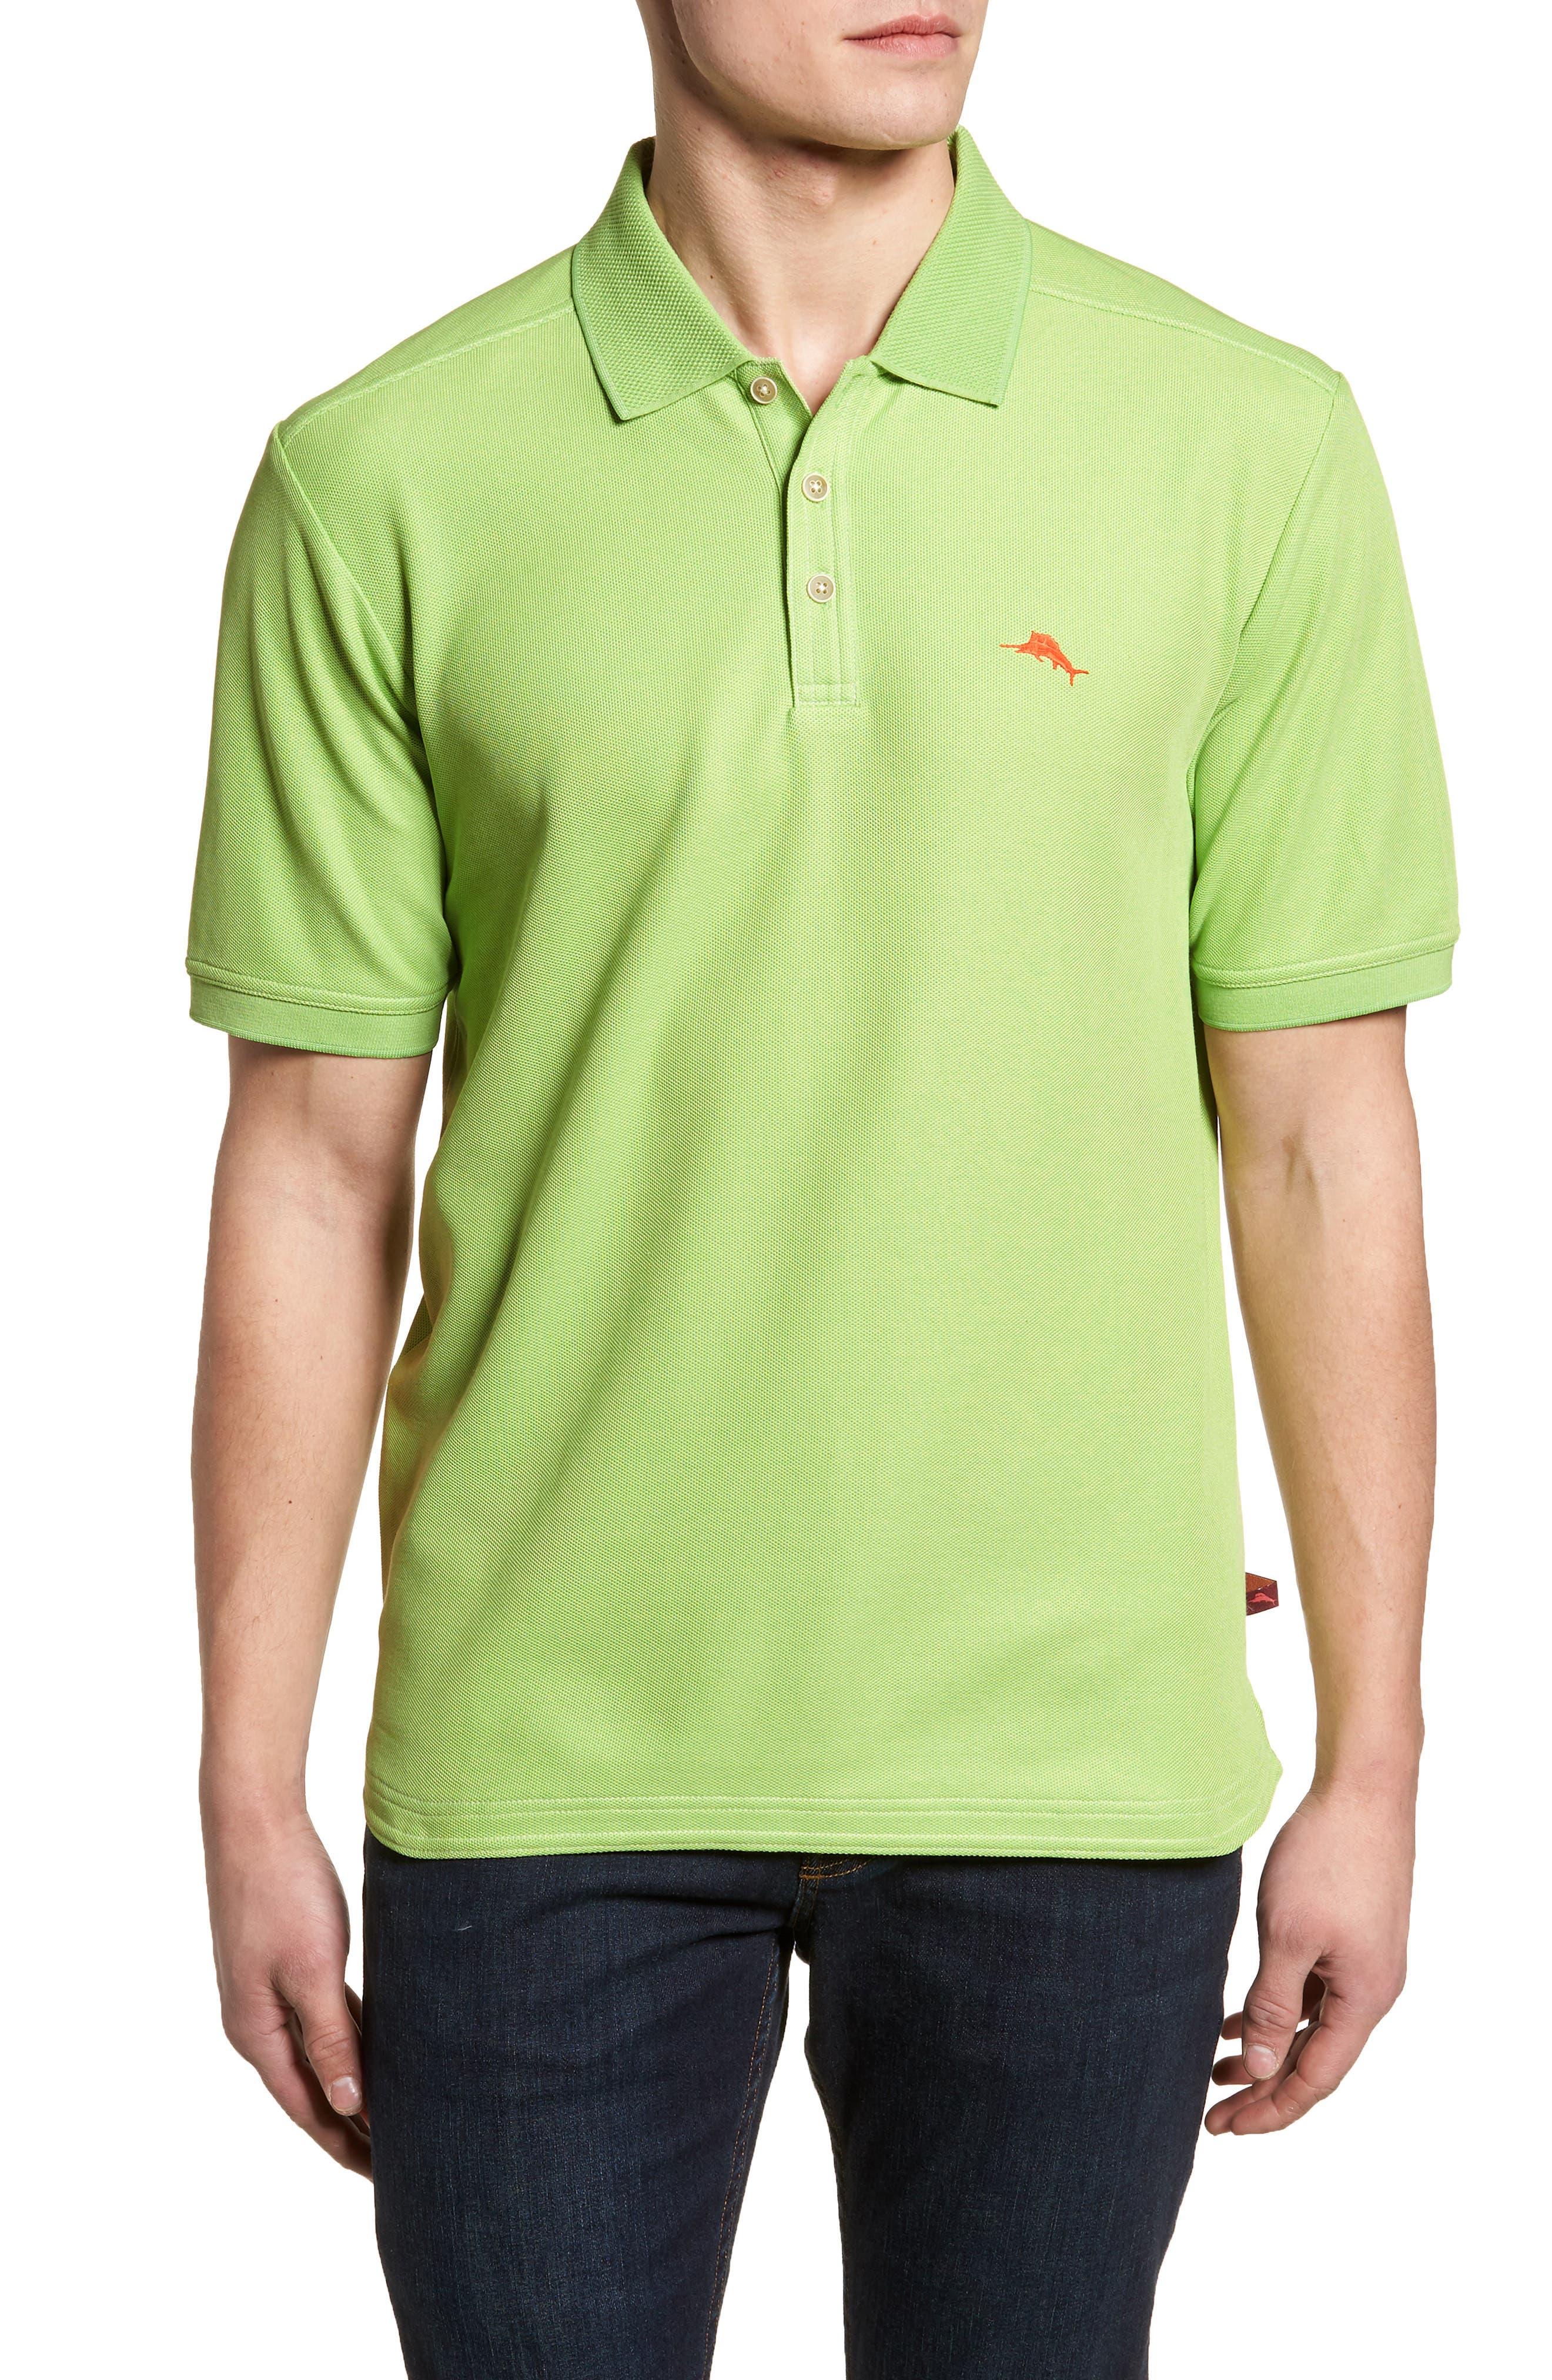 'The Emfielder' Original Fit Piqué Polo,                         Main,                         color, Caicos Green